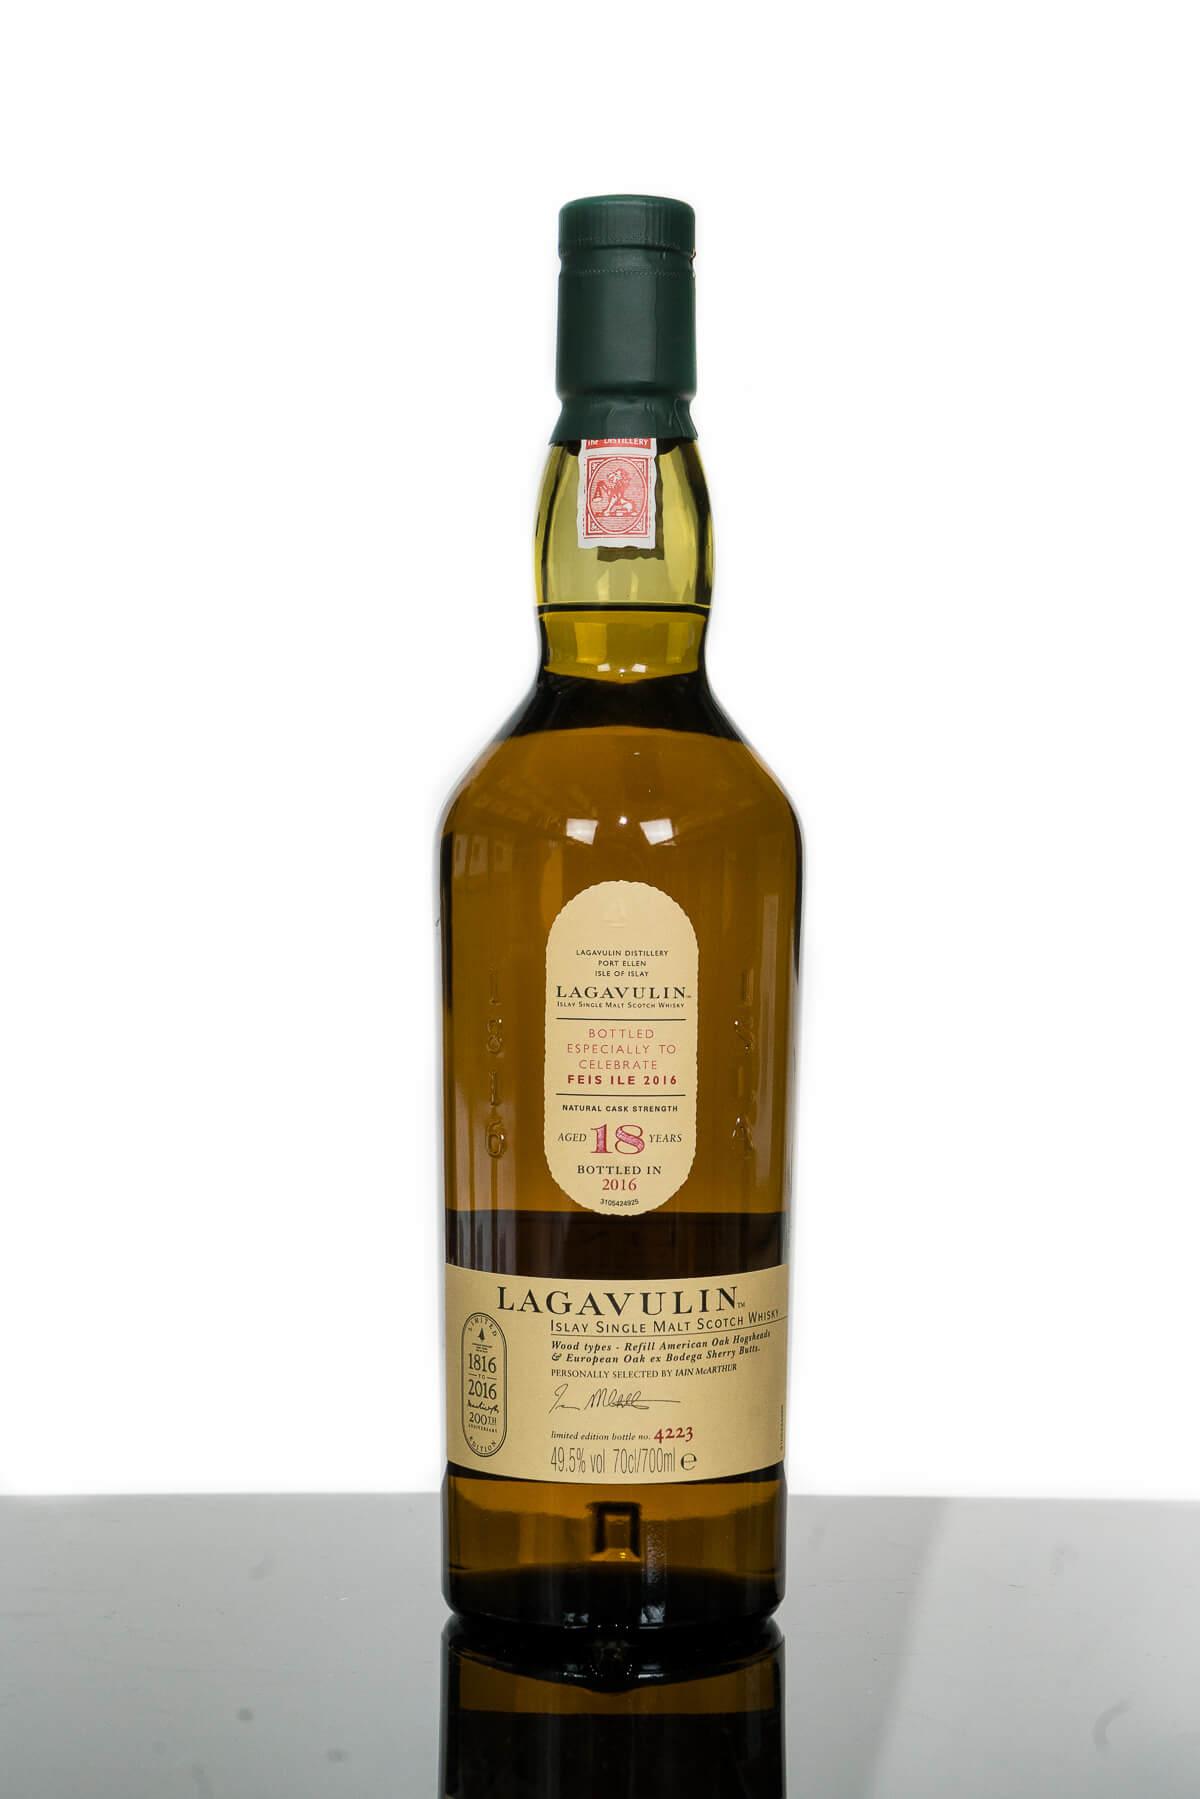 Lagavulin Aged 18 Years Feis Ile 2016 200th Anniversary Islay Single Malt Scotch Whisky (700ml)